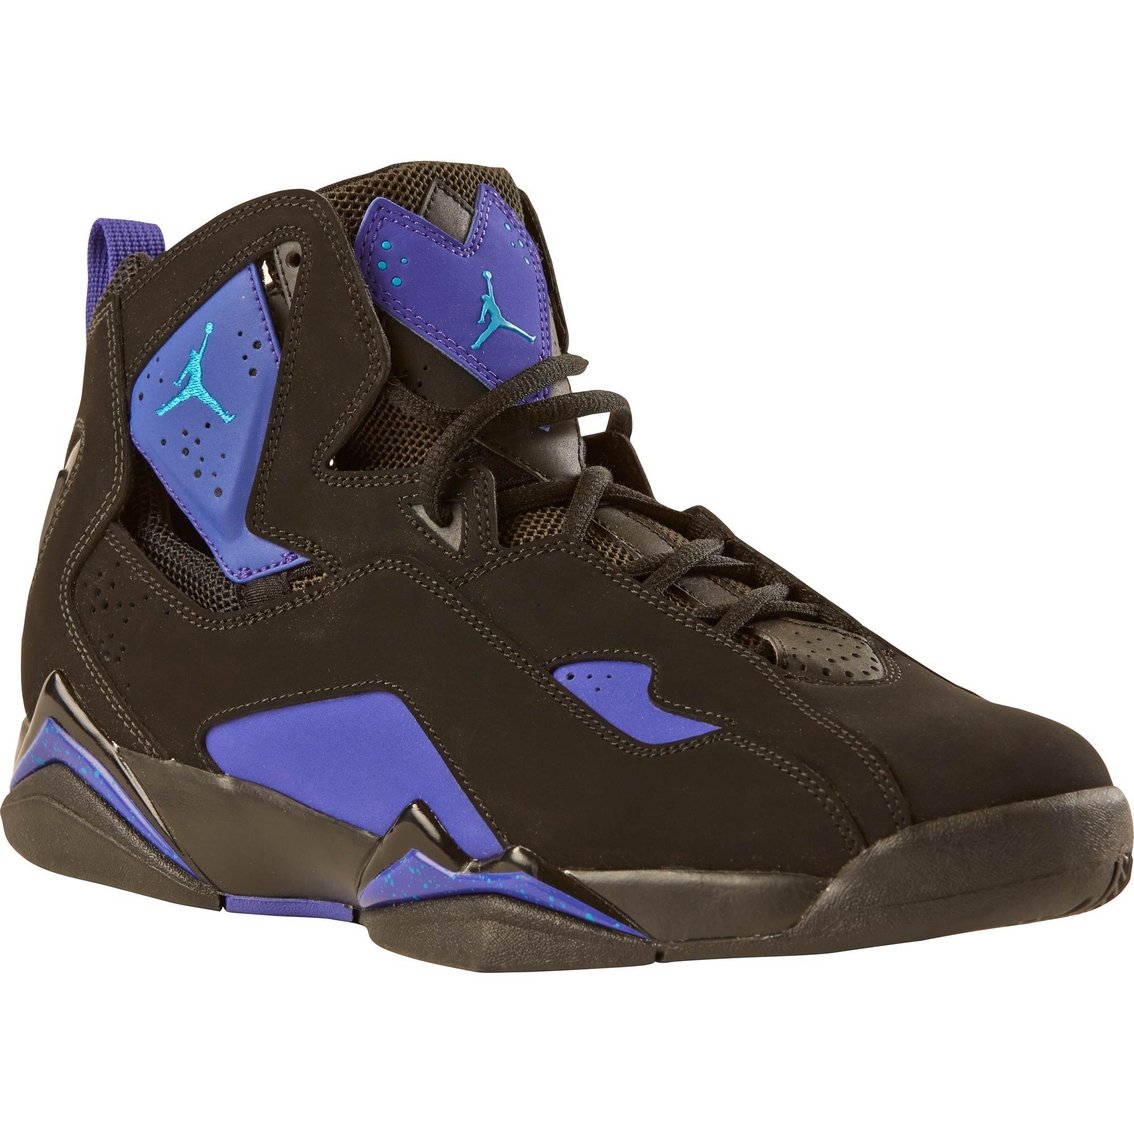 915d55b33fc Jordan Men s True Flight Men s Basketball Shoes